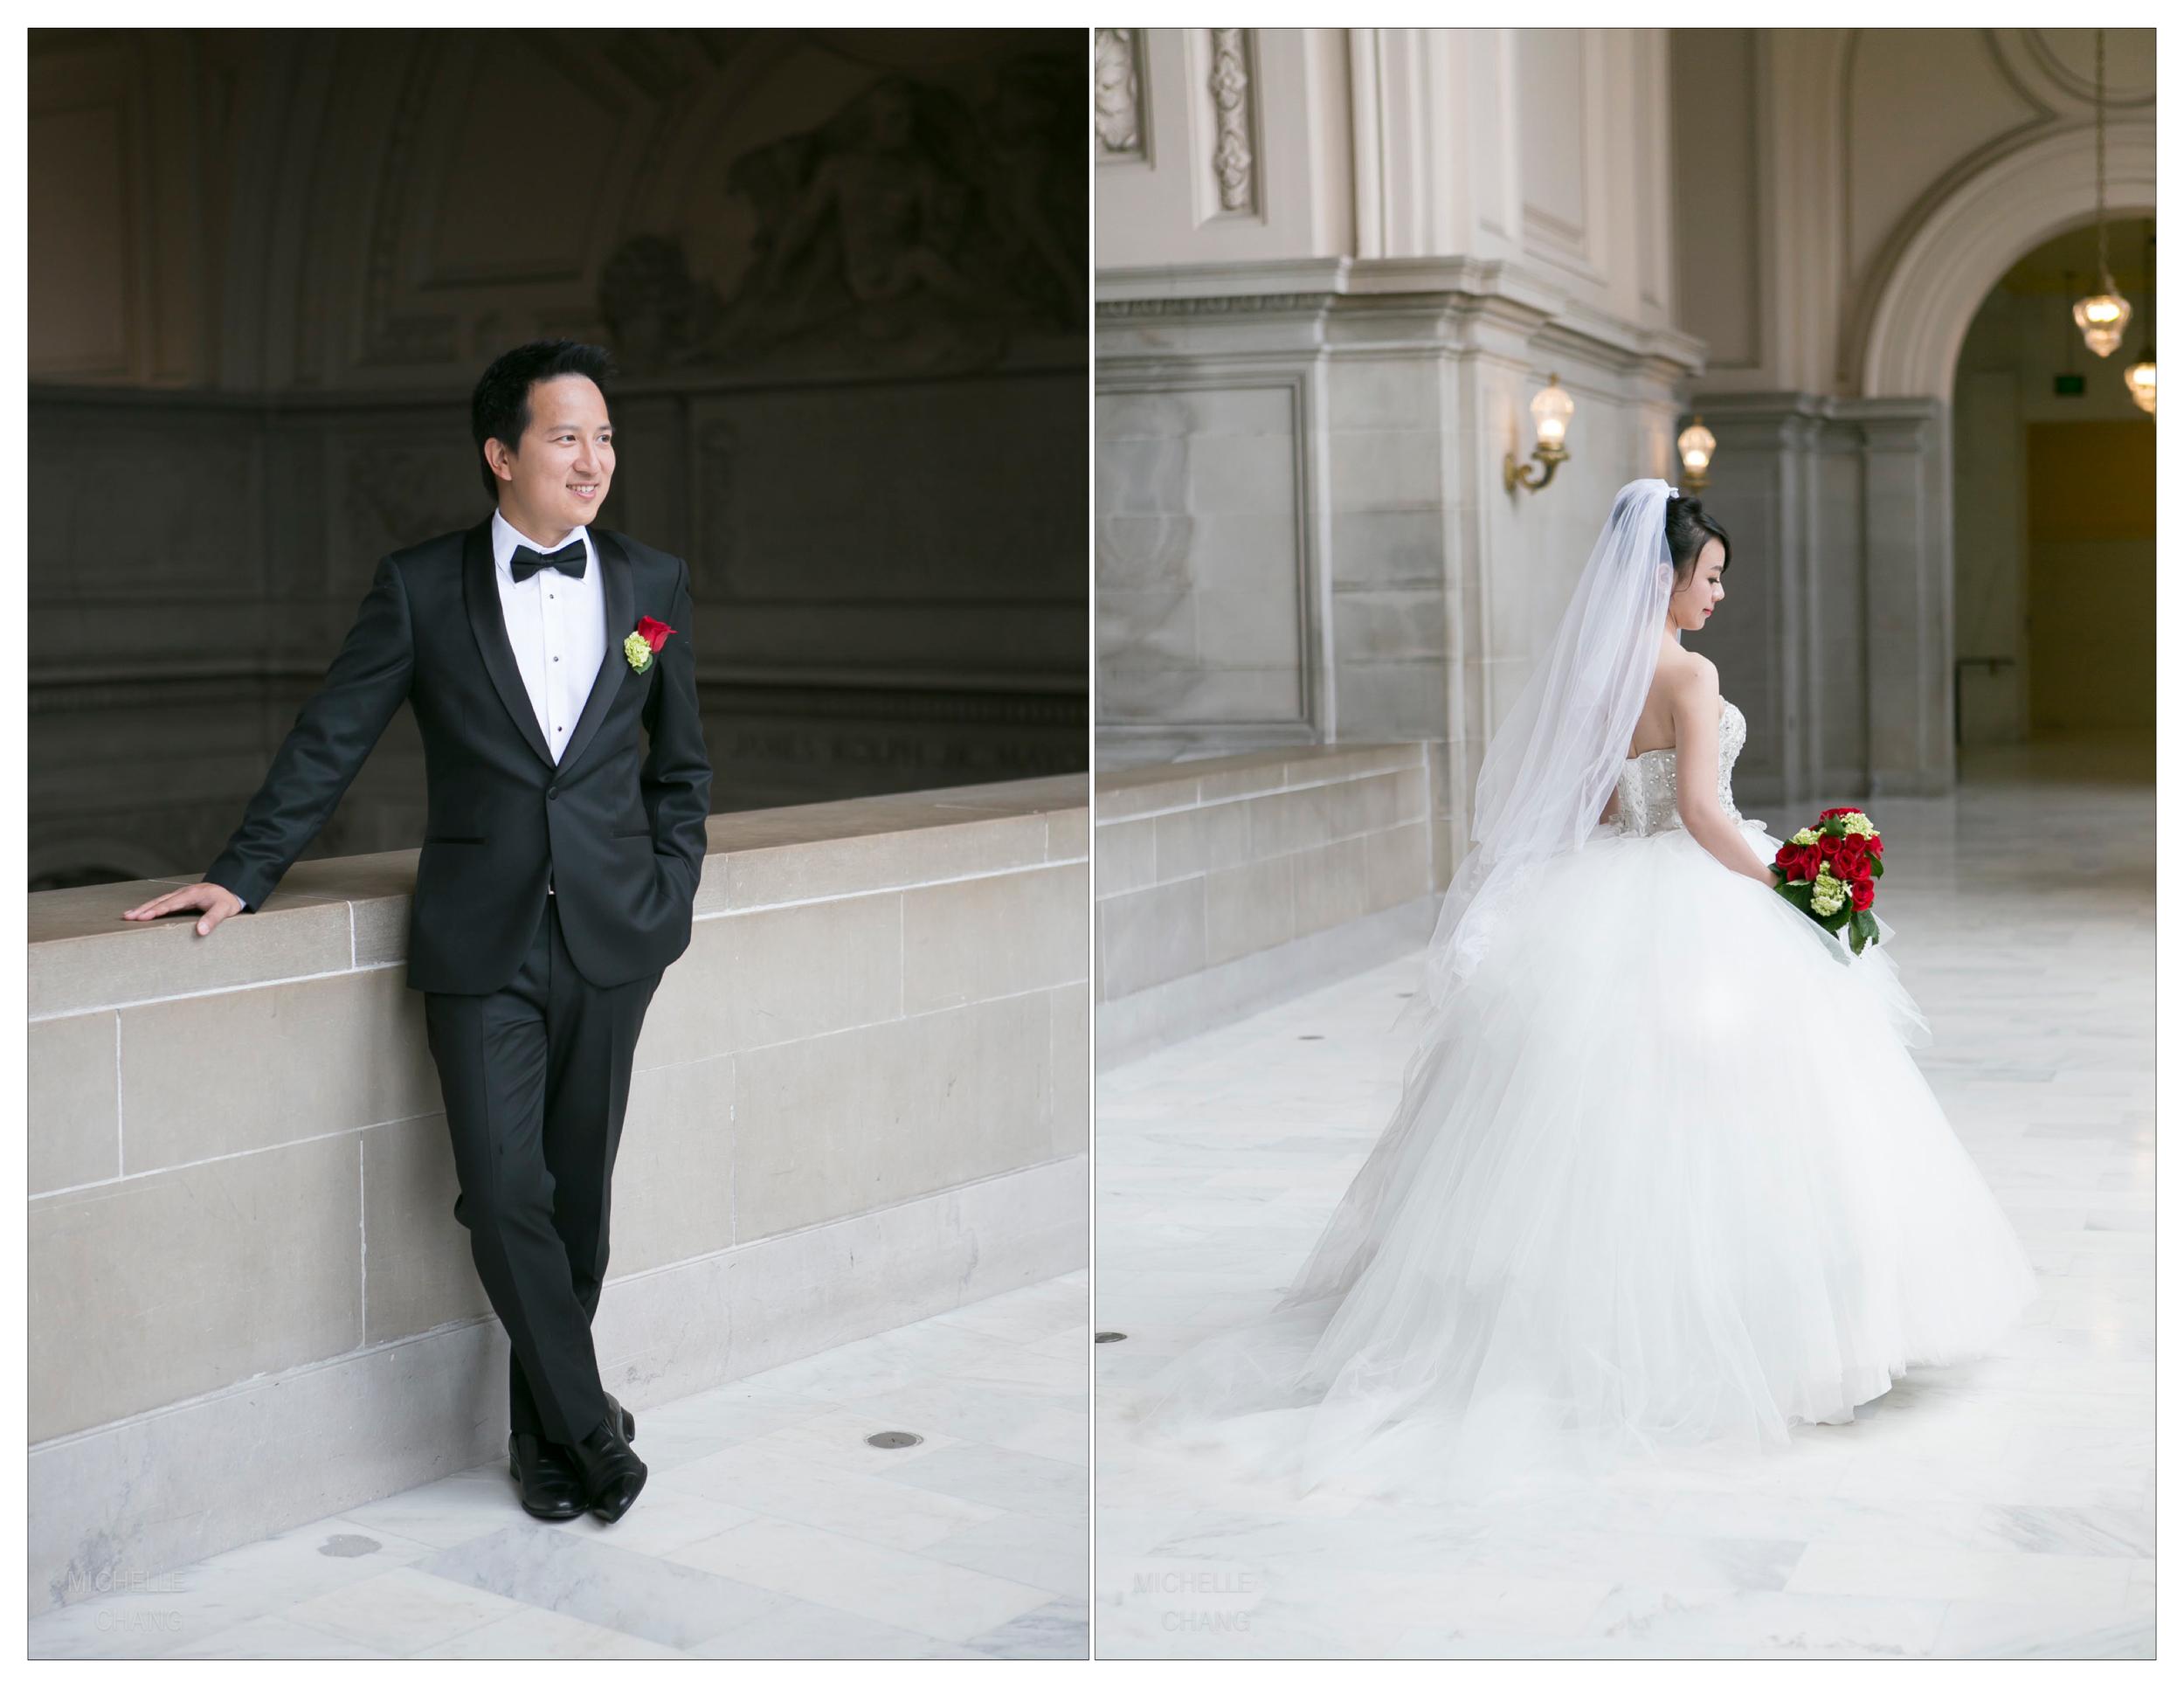 Michelle Chang Photography - San Francisco City Hall Wedding